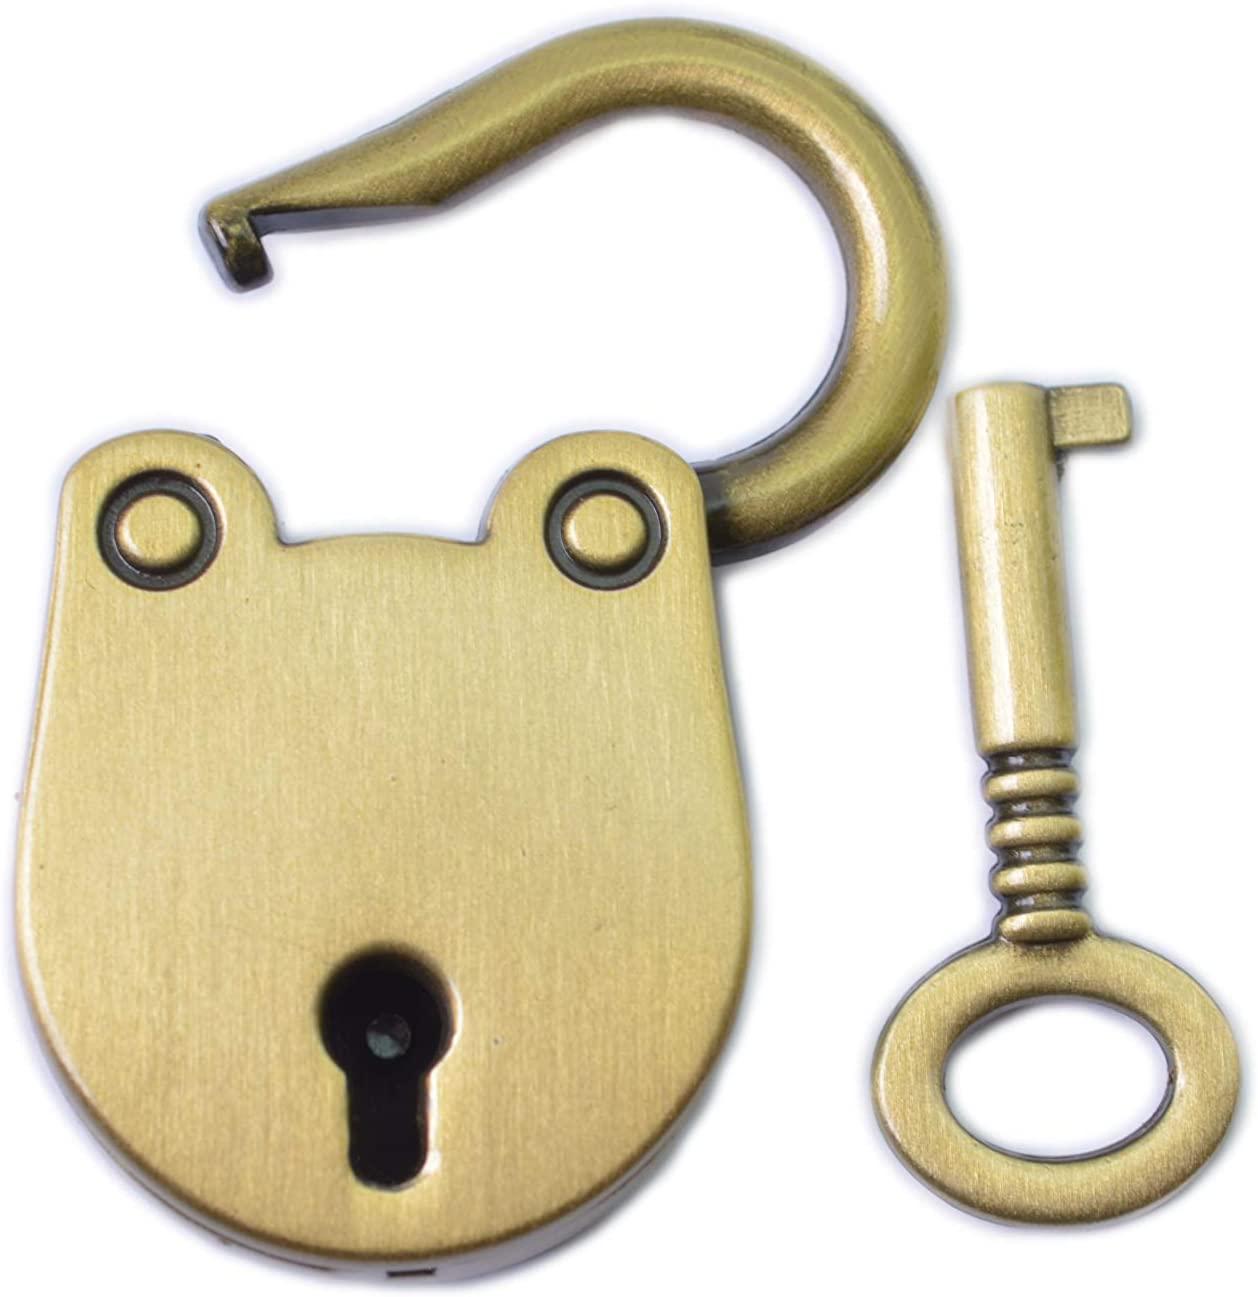 Bobeey 2pcs Bear Head Shape Turnlock Purses Twist Turn Locks Closures Bag Closure Suitcase Locks,Luggage Lock BBL12(Brushed Brass)